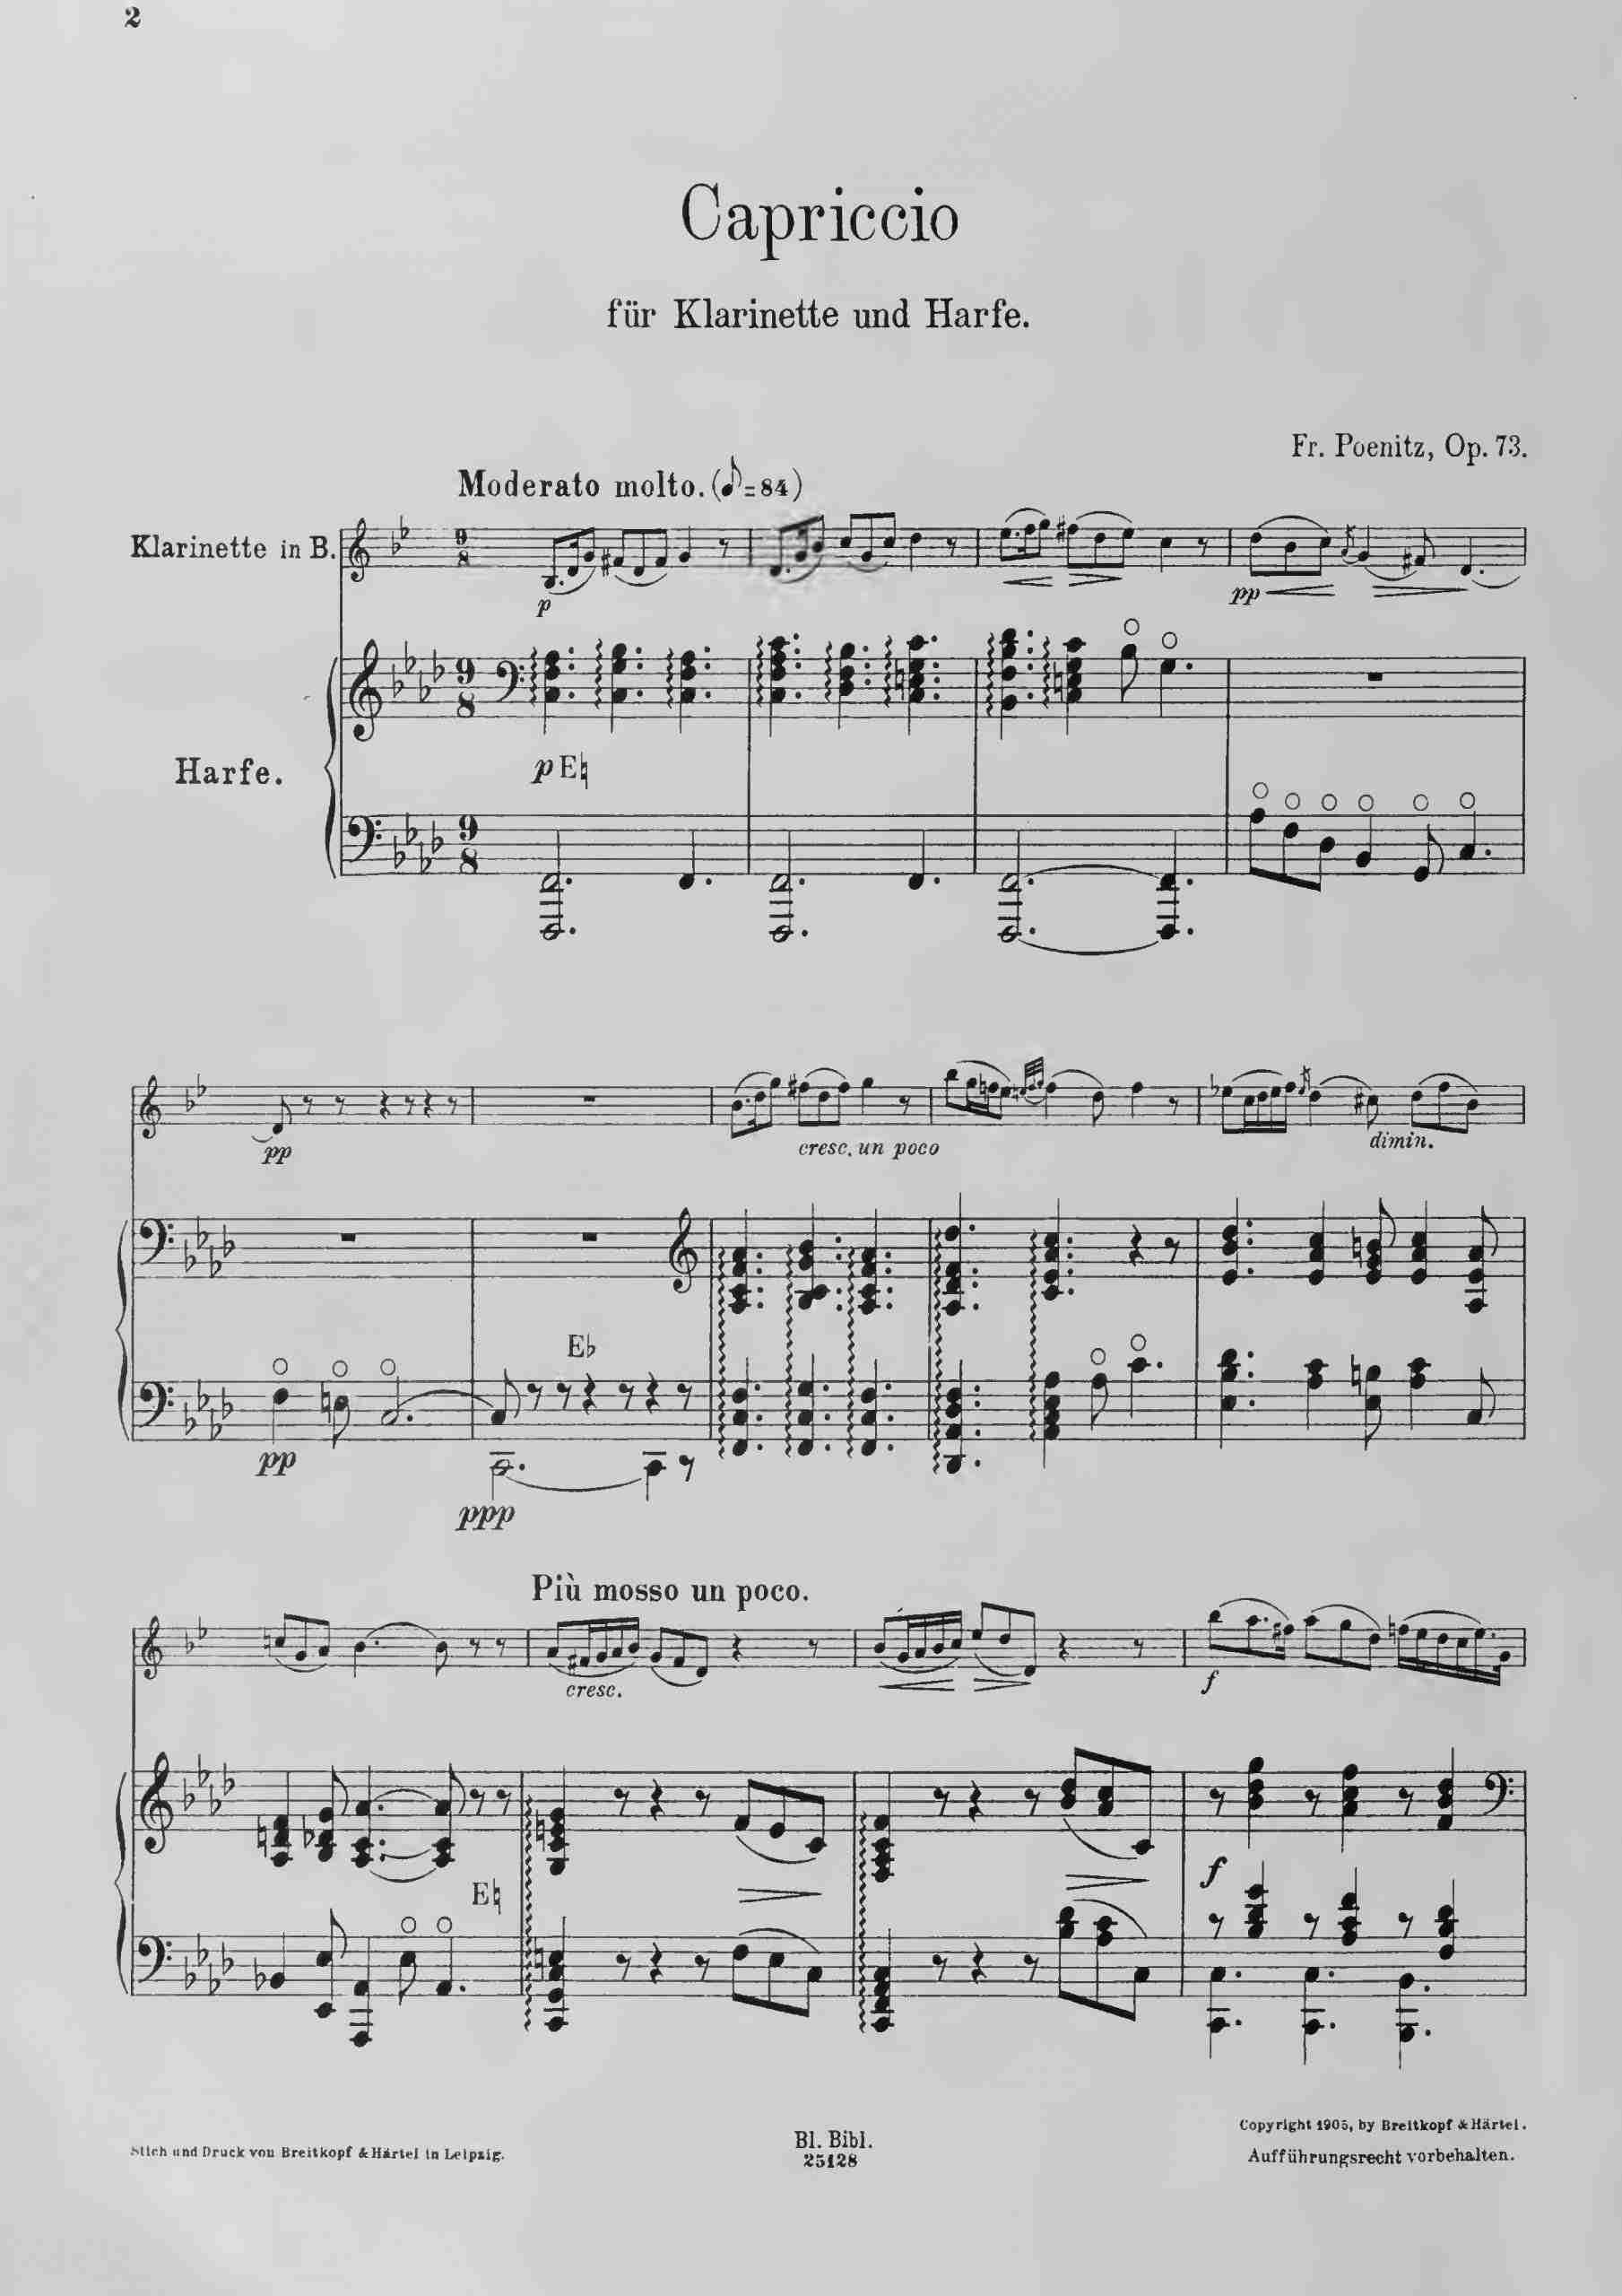 Poenitz, Franz - Capriccio, Op.73